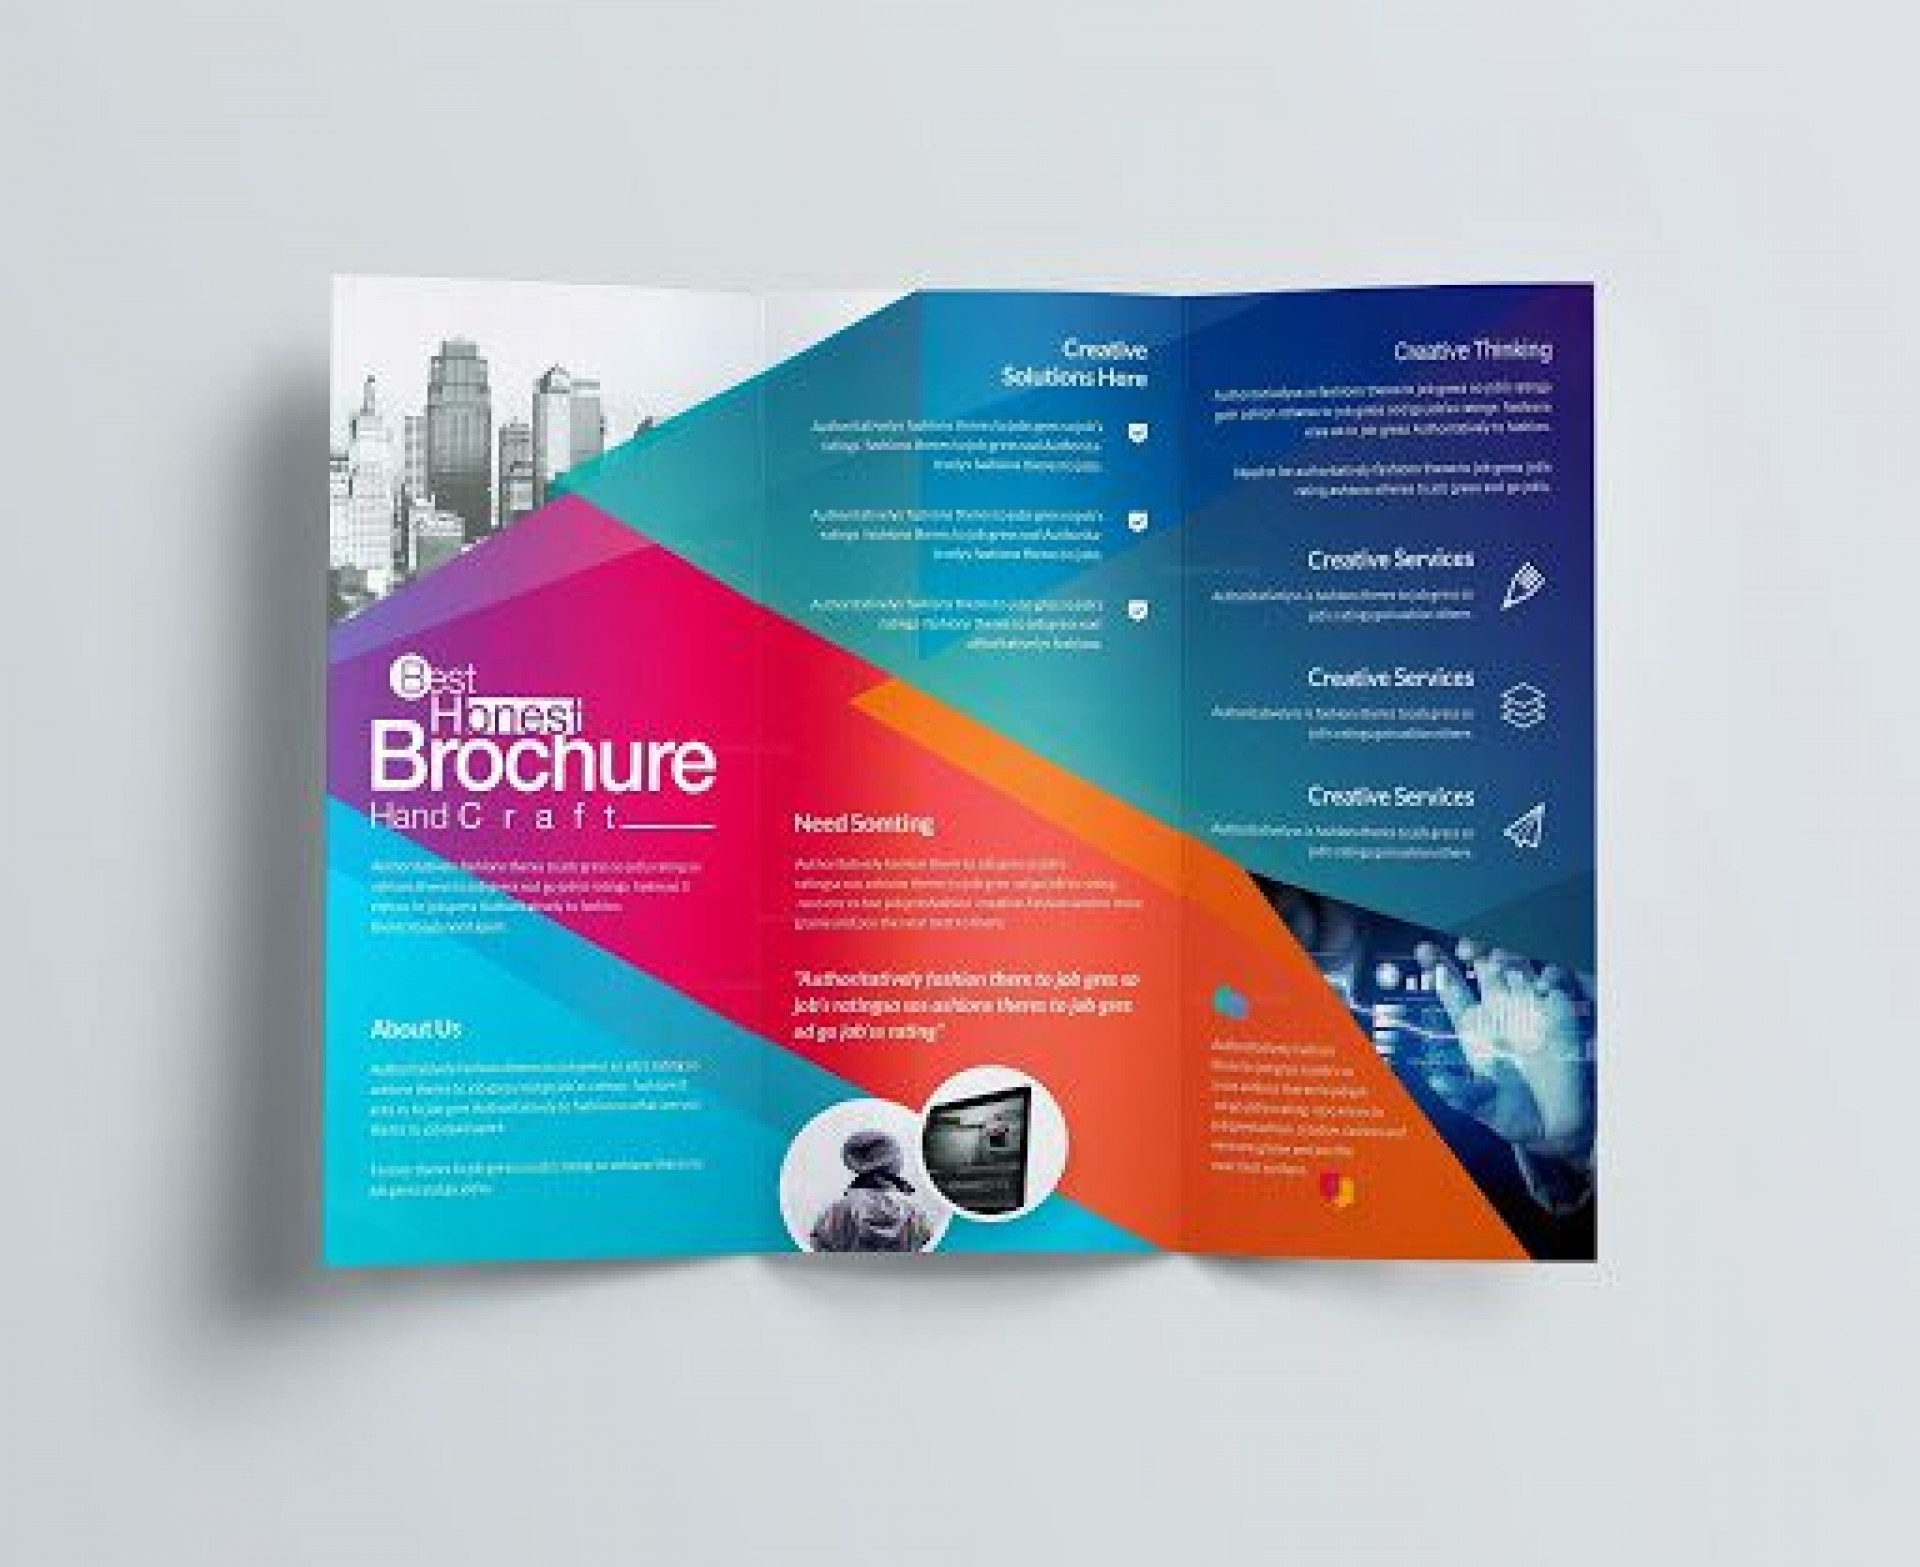 009 Fantastic Download Brochure Template For Word 2007 Sample 1920